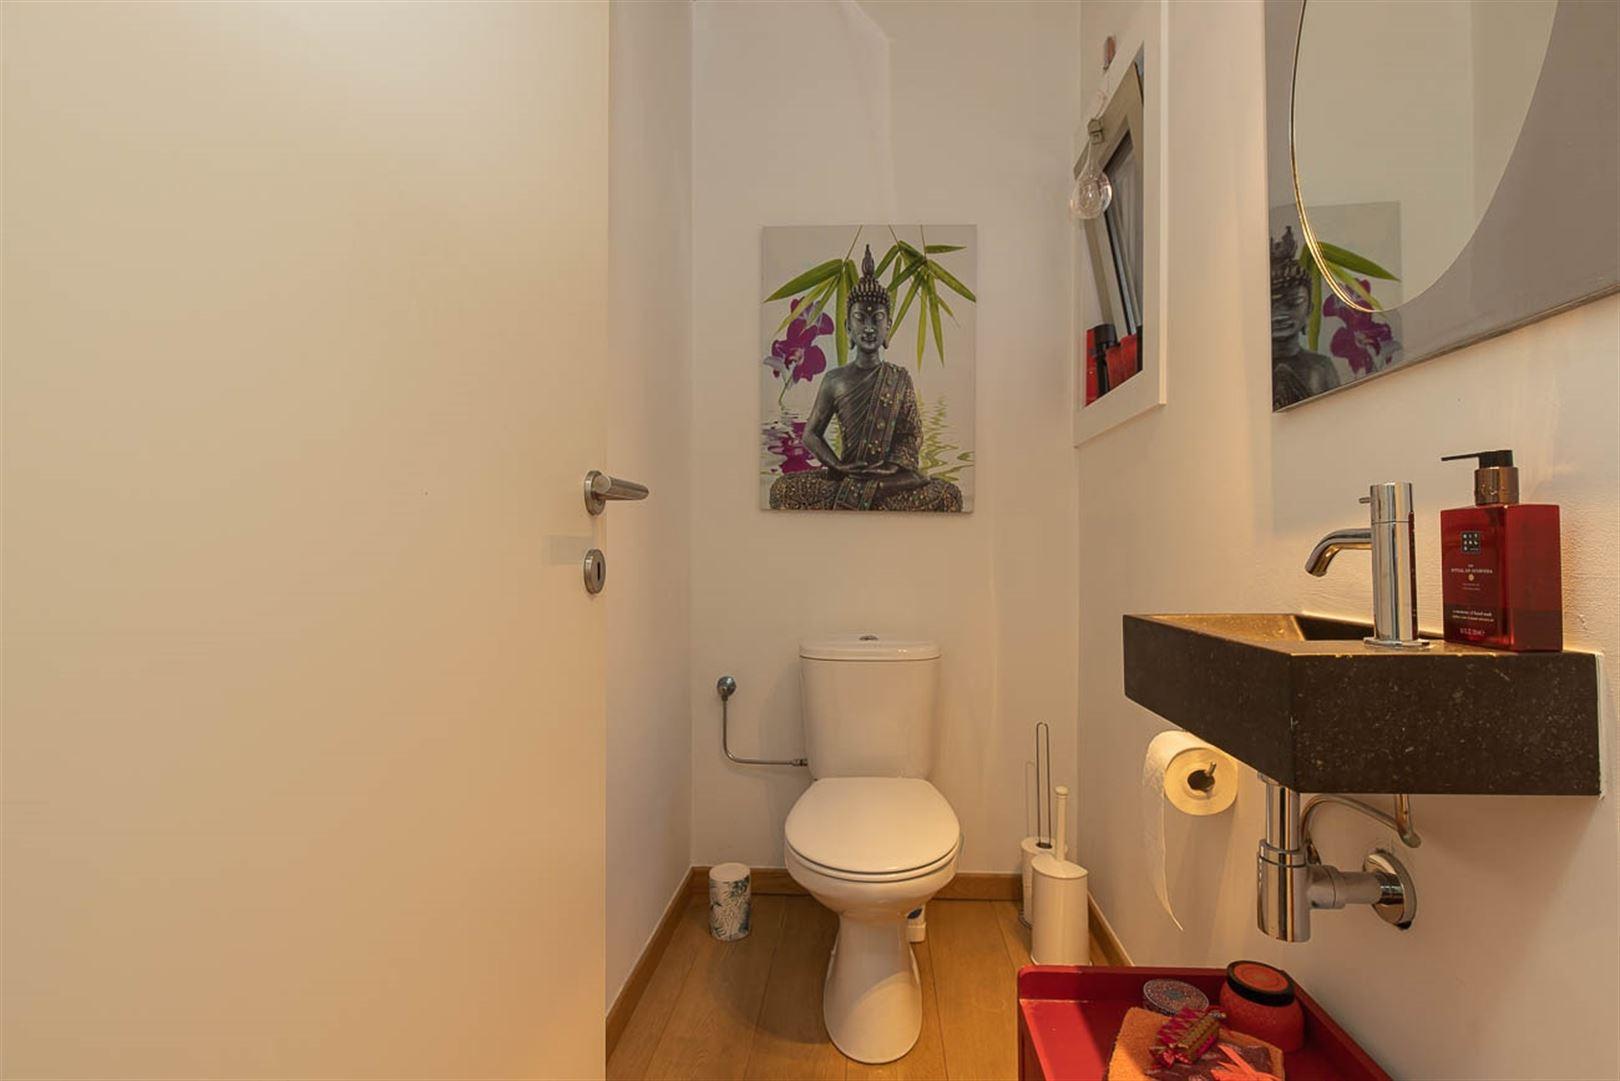 Foto 14 : Duplex/triplex te 9200 DENDERMONDE (België) - Prijs € 495.000